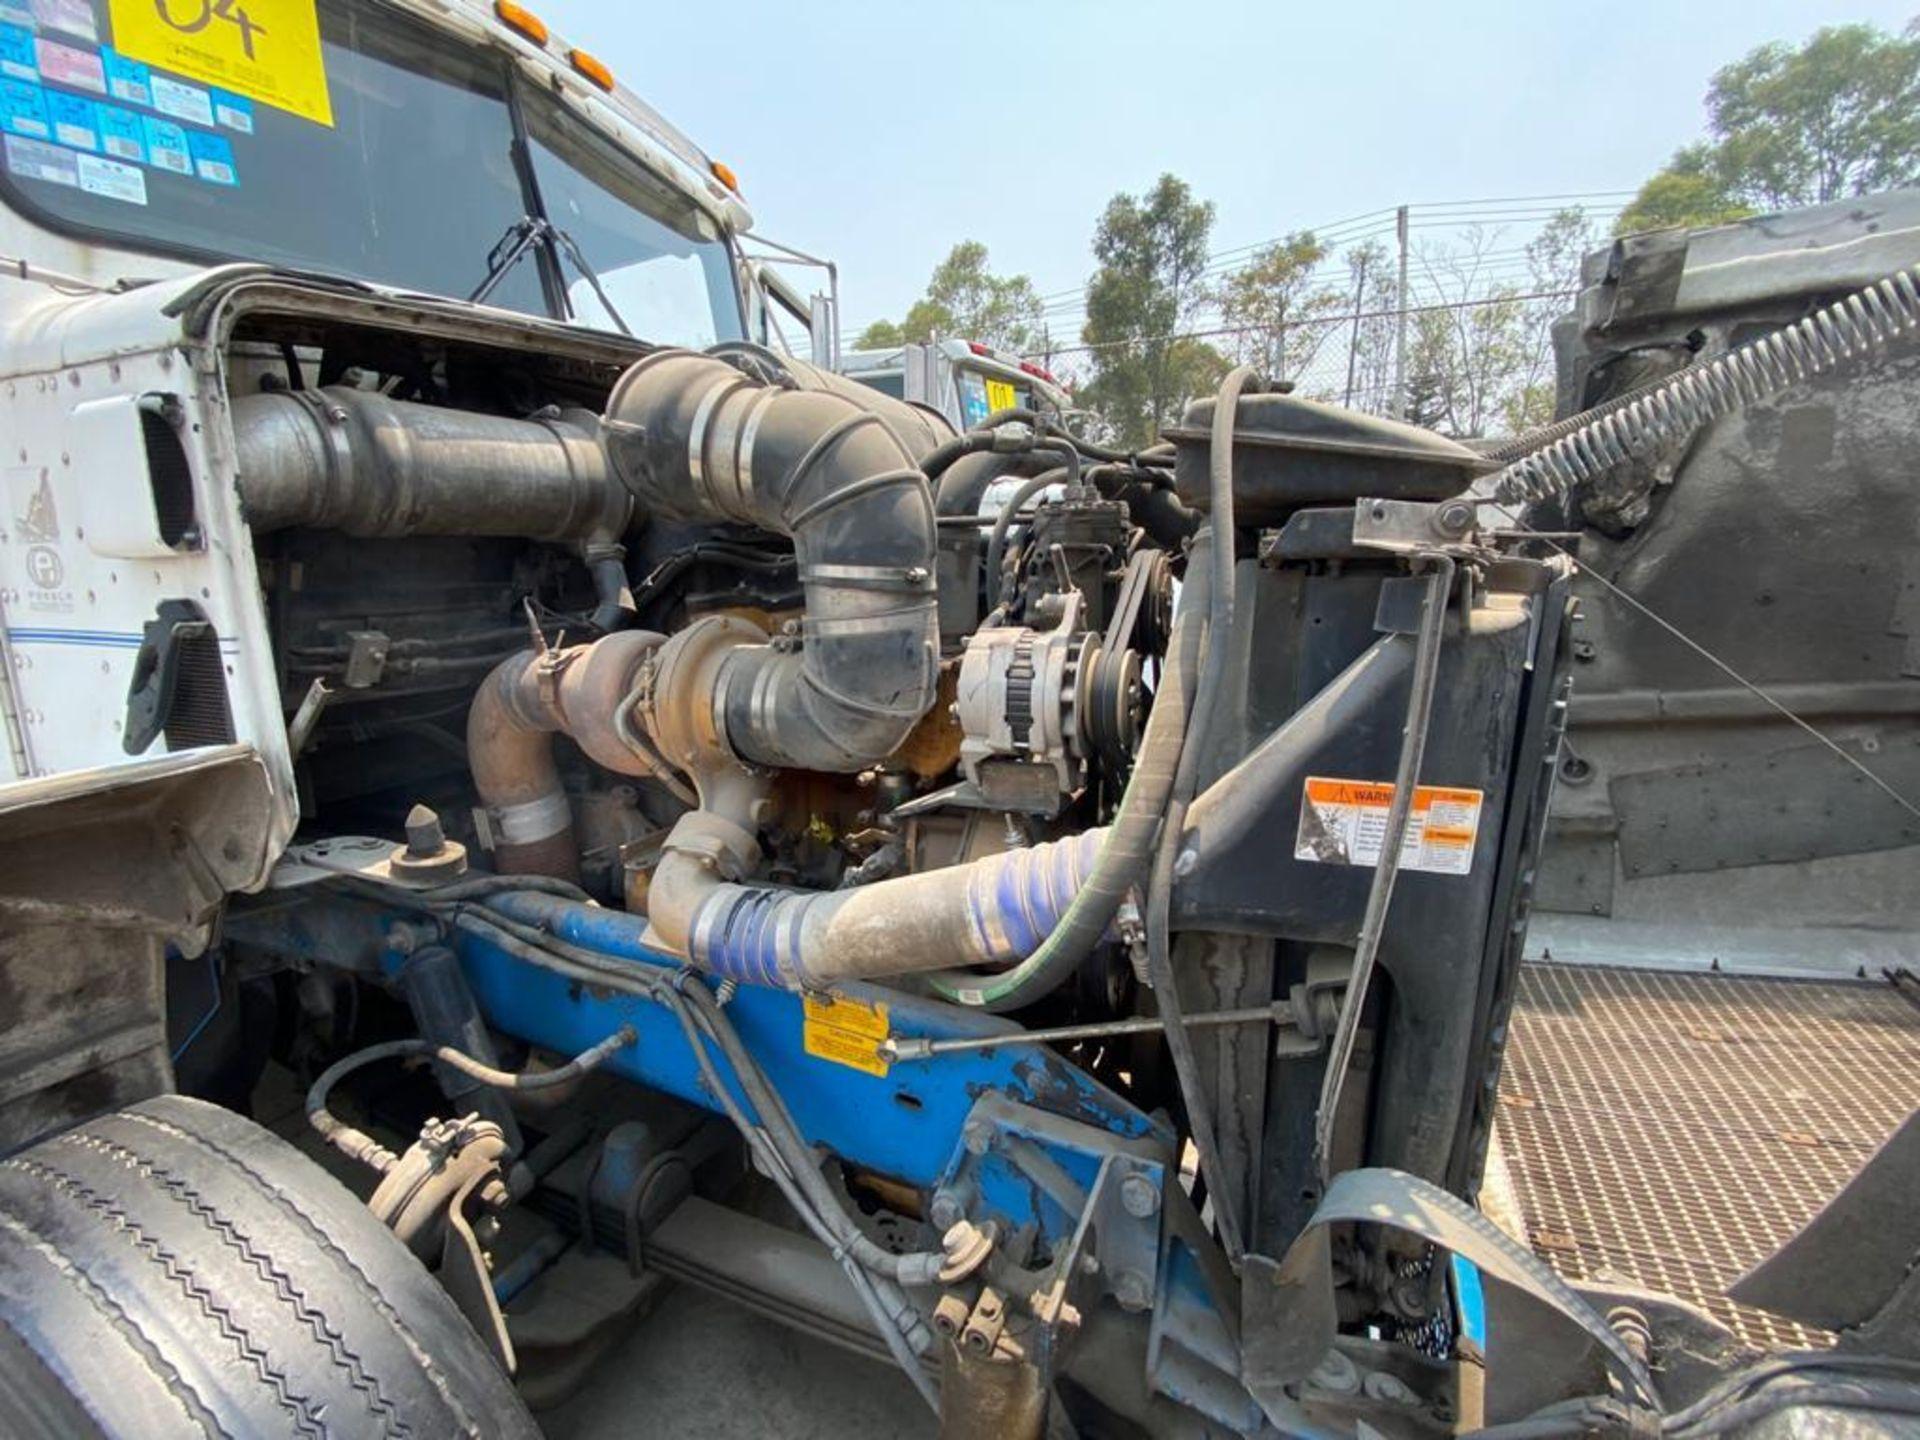 1999 Kenworth Sleeper truck tractor, standard transmission of 18 speeds - Image 66 of 70